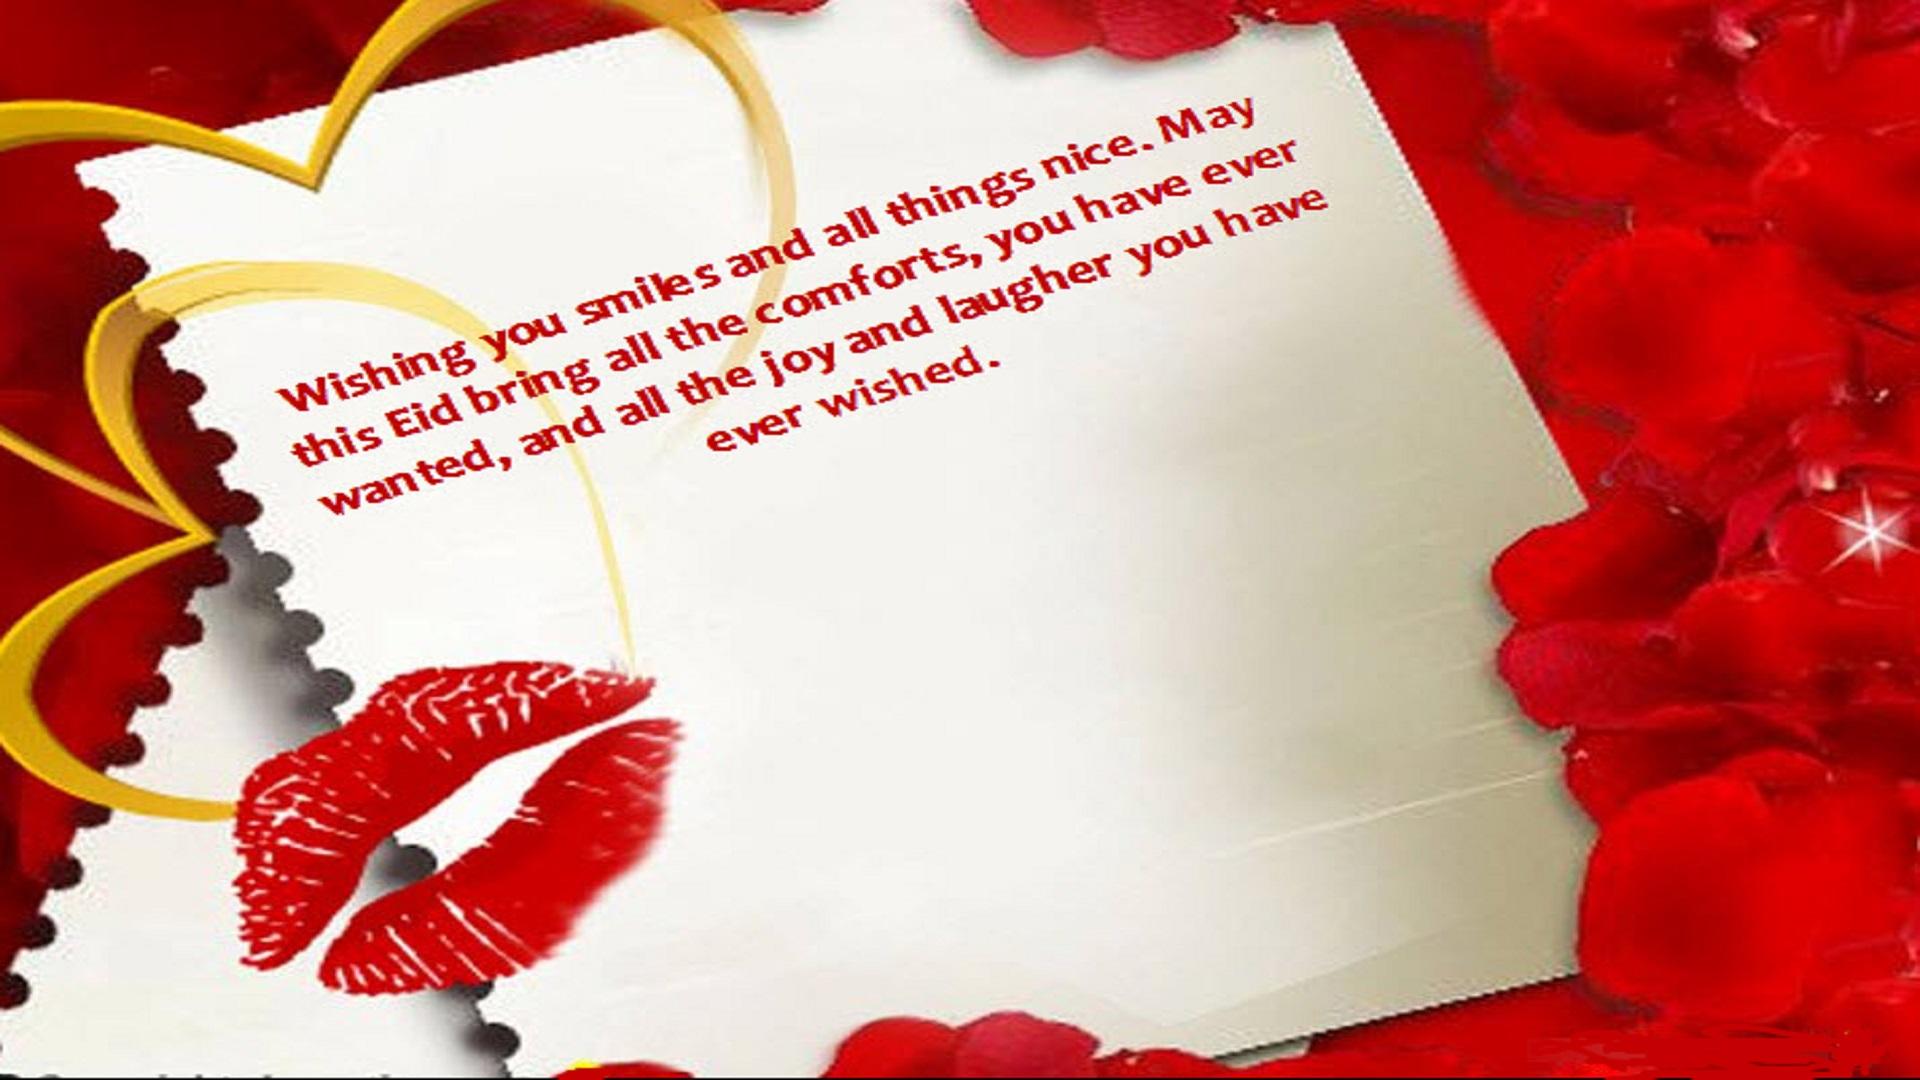 Eid-Mubarak-Card-Download-free-hd-wallpapers